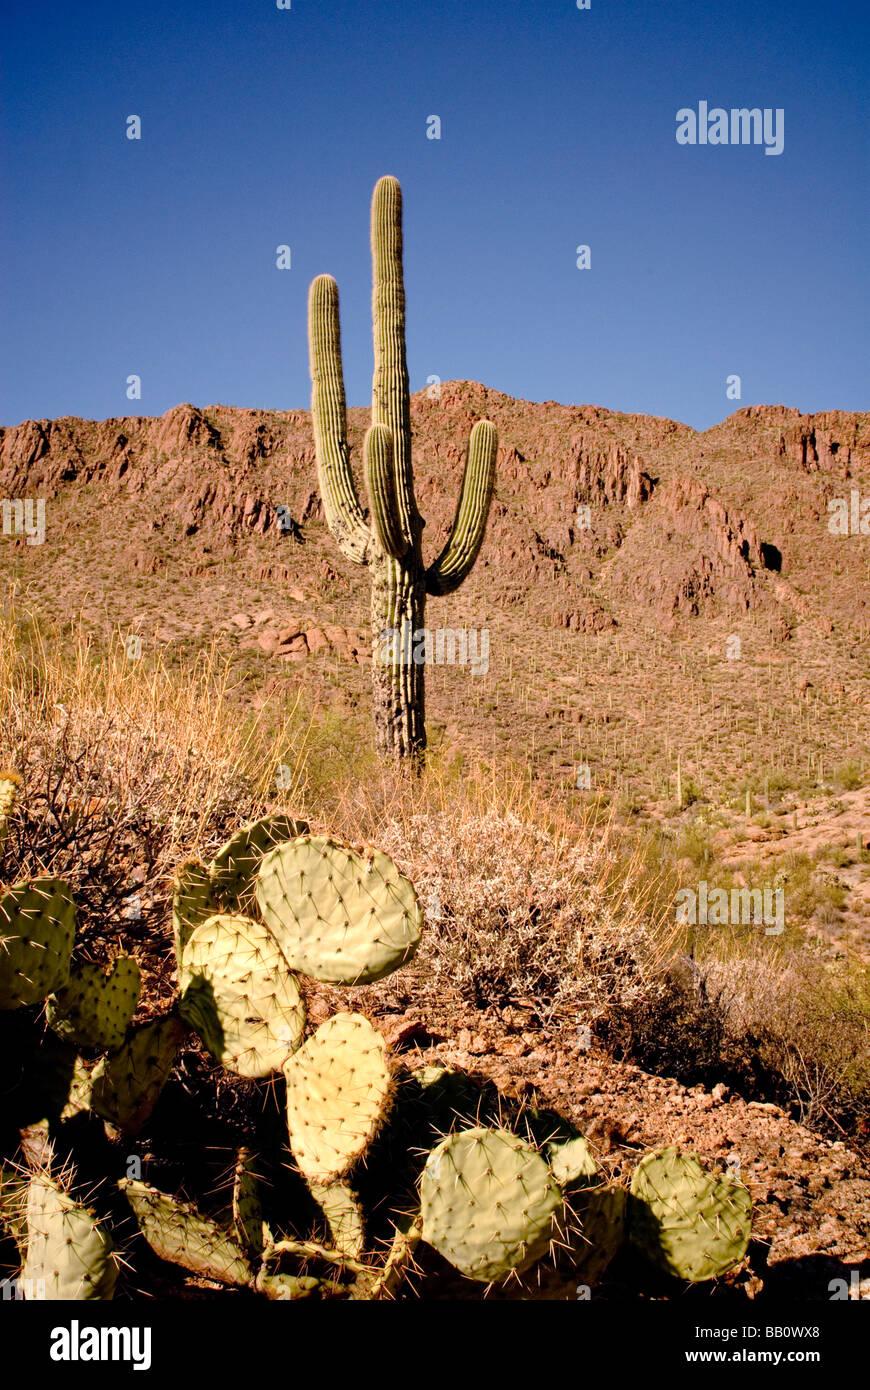 Dos tipos de Cactus Saguaro National Park en Tucson, Arizona. Imagen De Stock